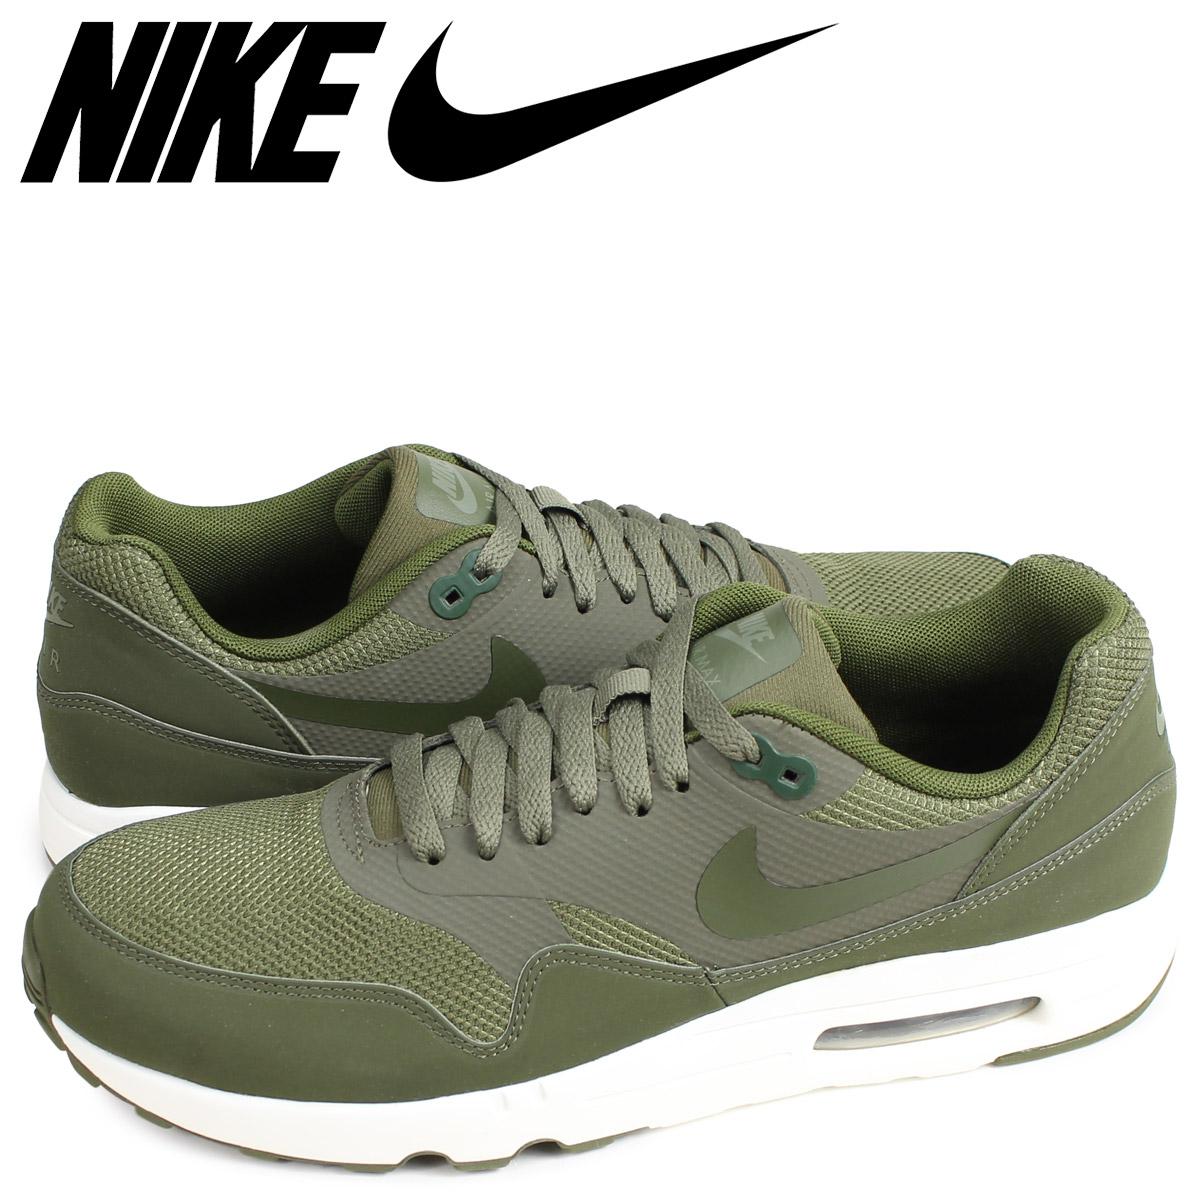 875679 200 Nike Air Max 1 Ultra 2.0 Essential Medium Olivelegion Green sail